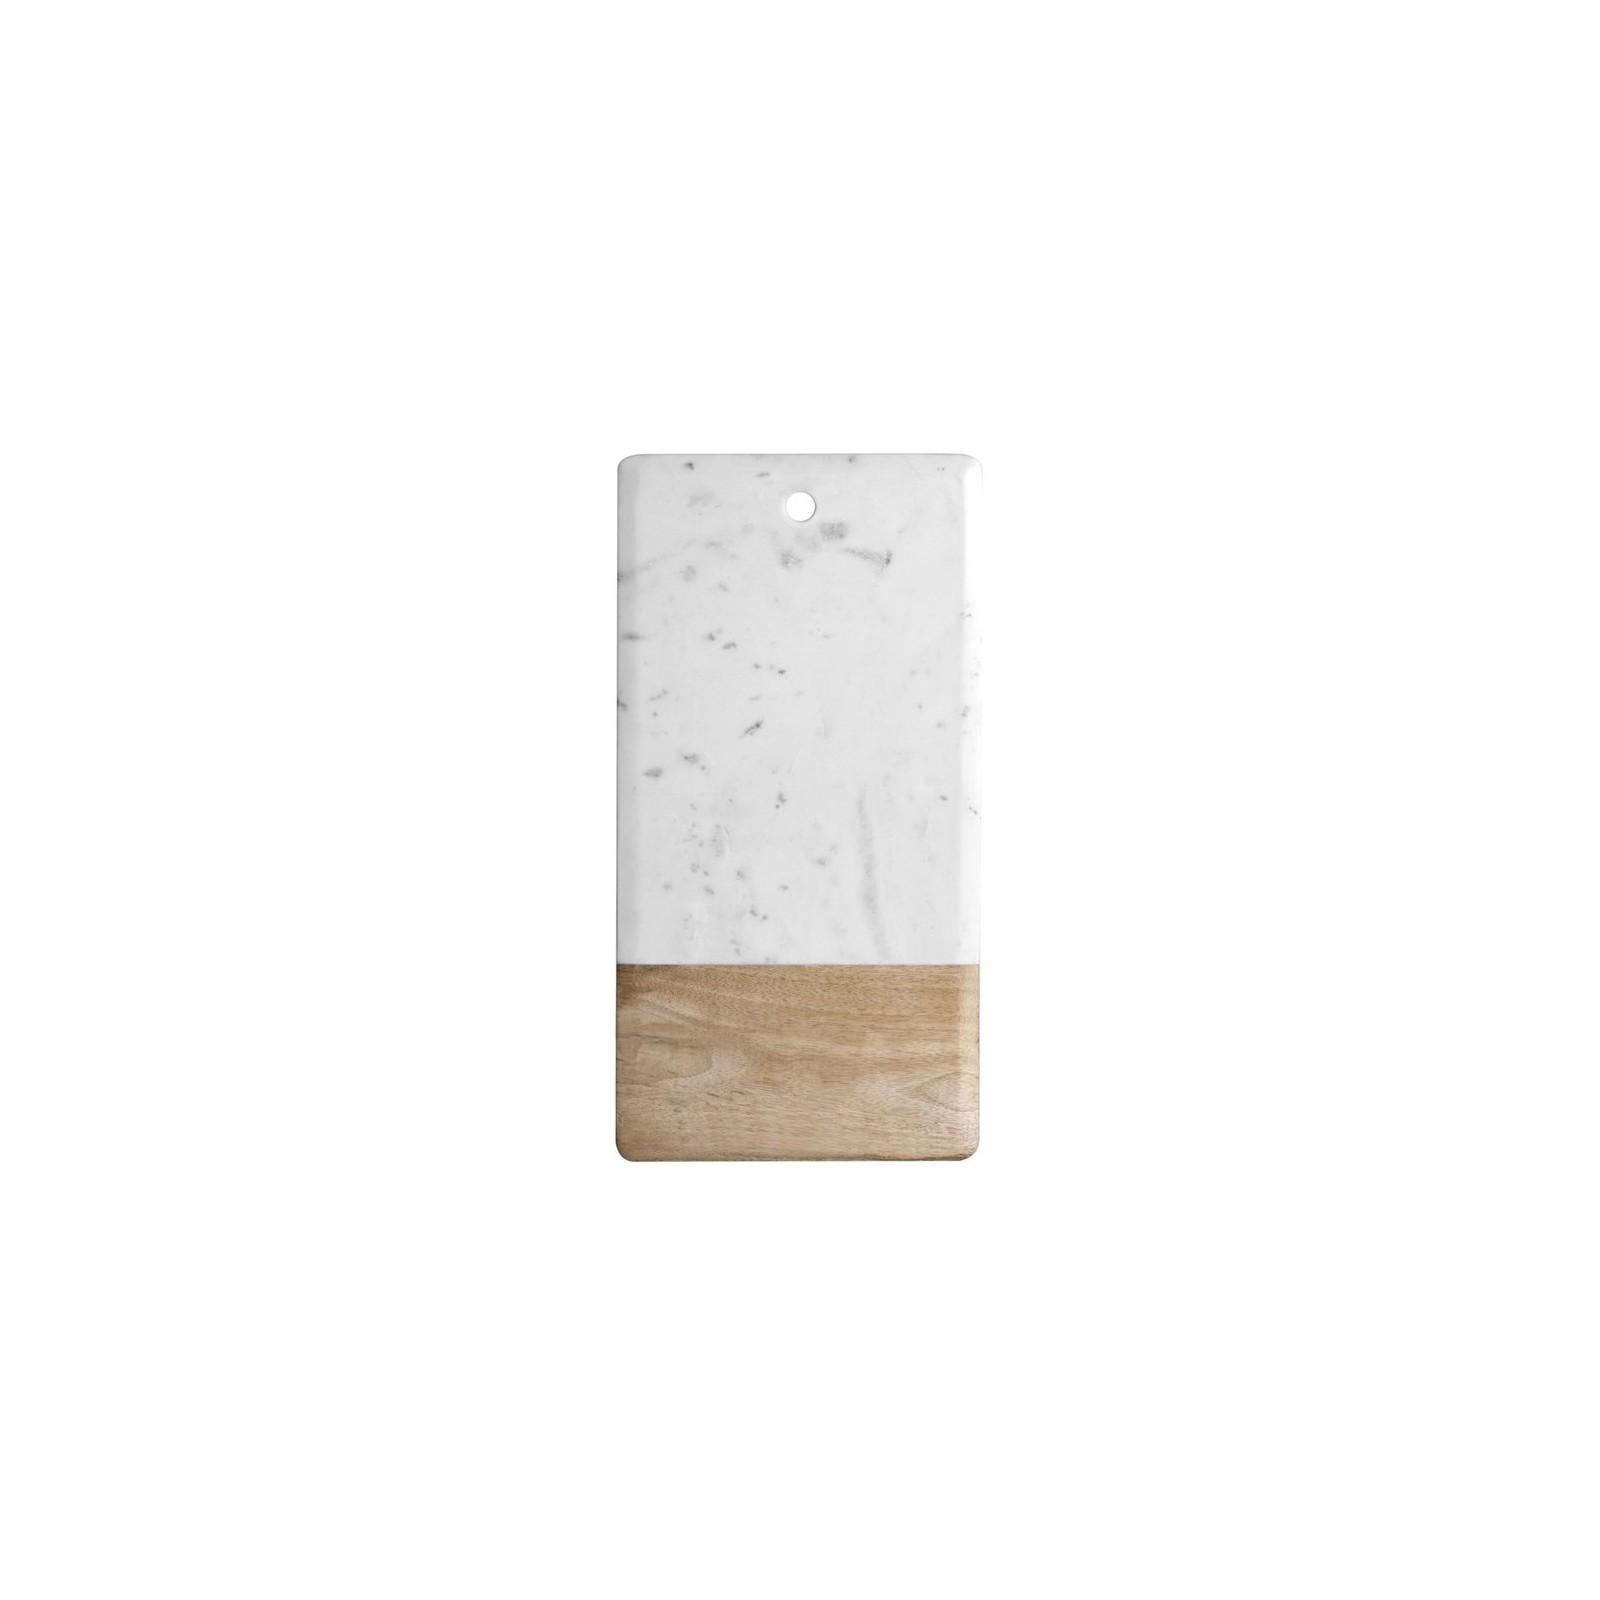 planche d couper marbre bois arne concept. Black Bedroom Furniture Sets. Home Design Ideas